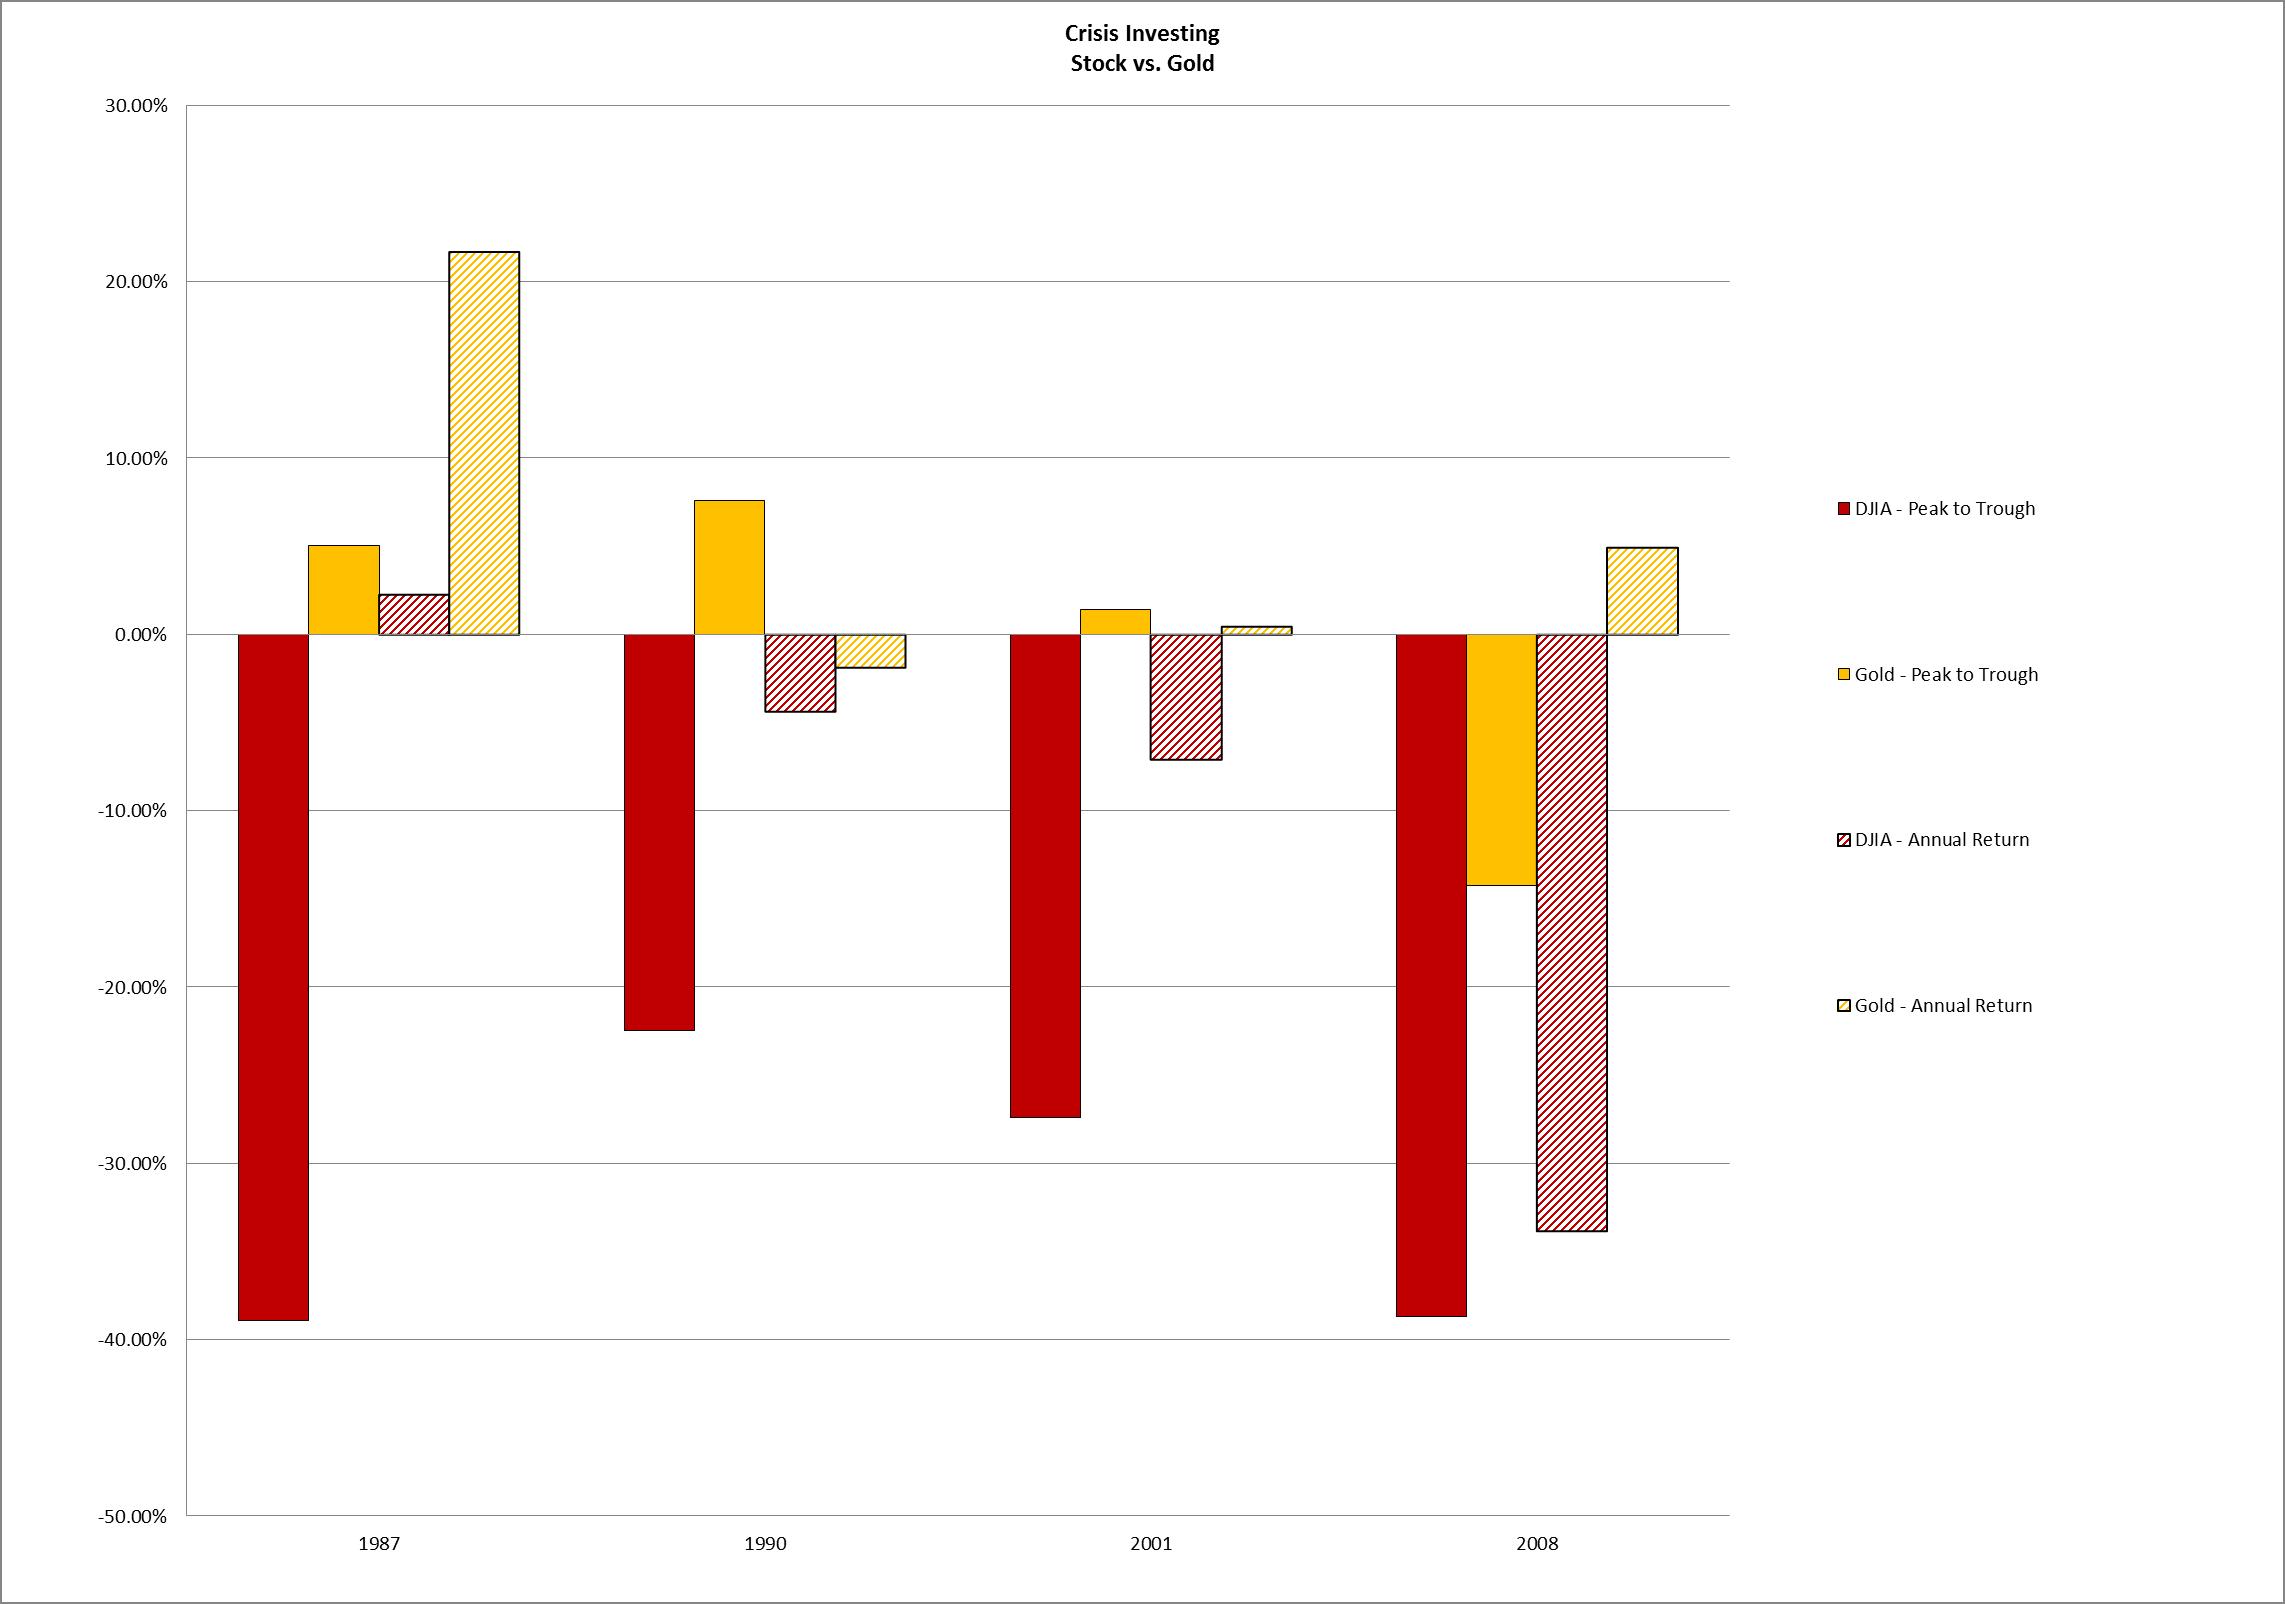 Crisis Investing Chart